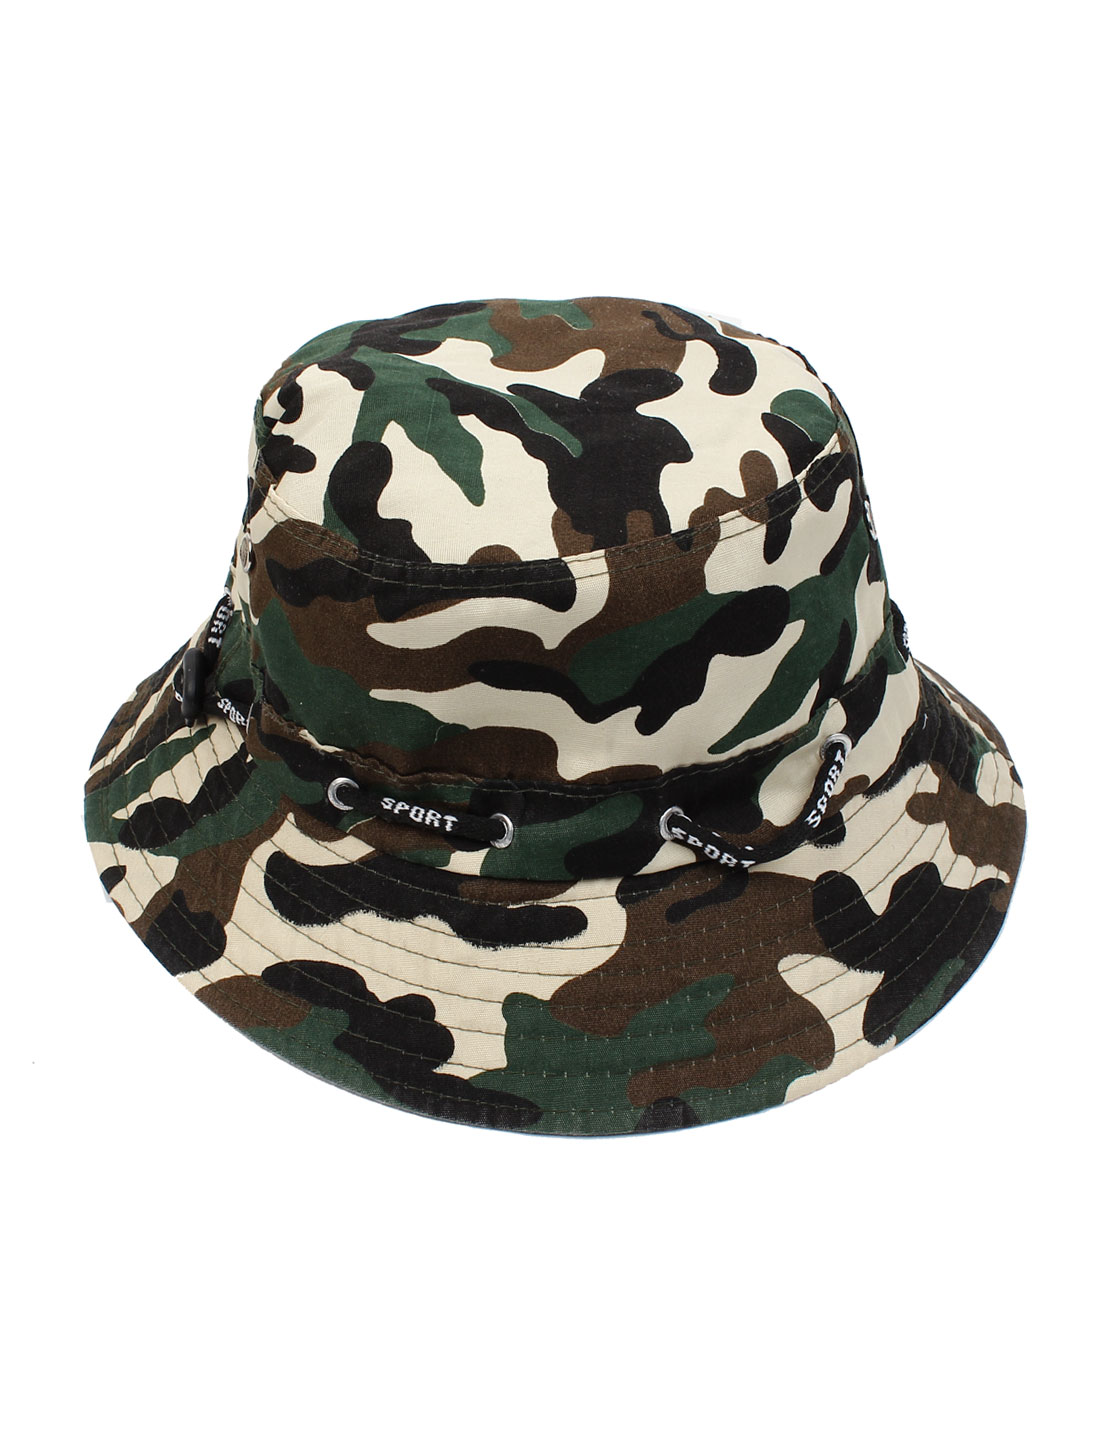 Sand Beach Round Brim Sun Visor Camouflage Hat Cap for Unisex